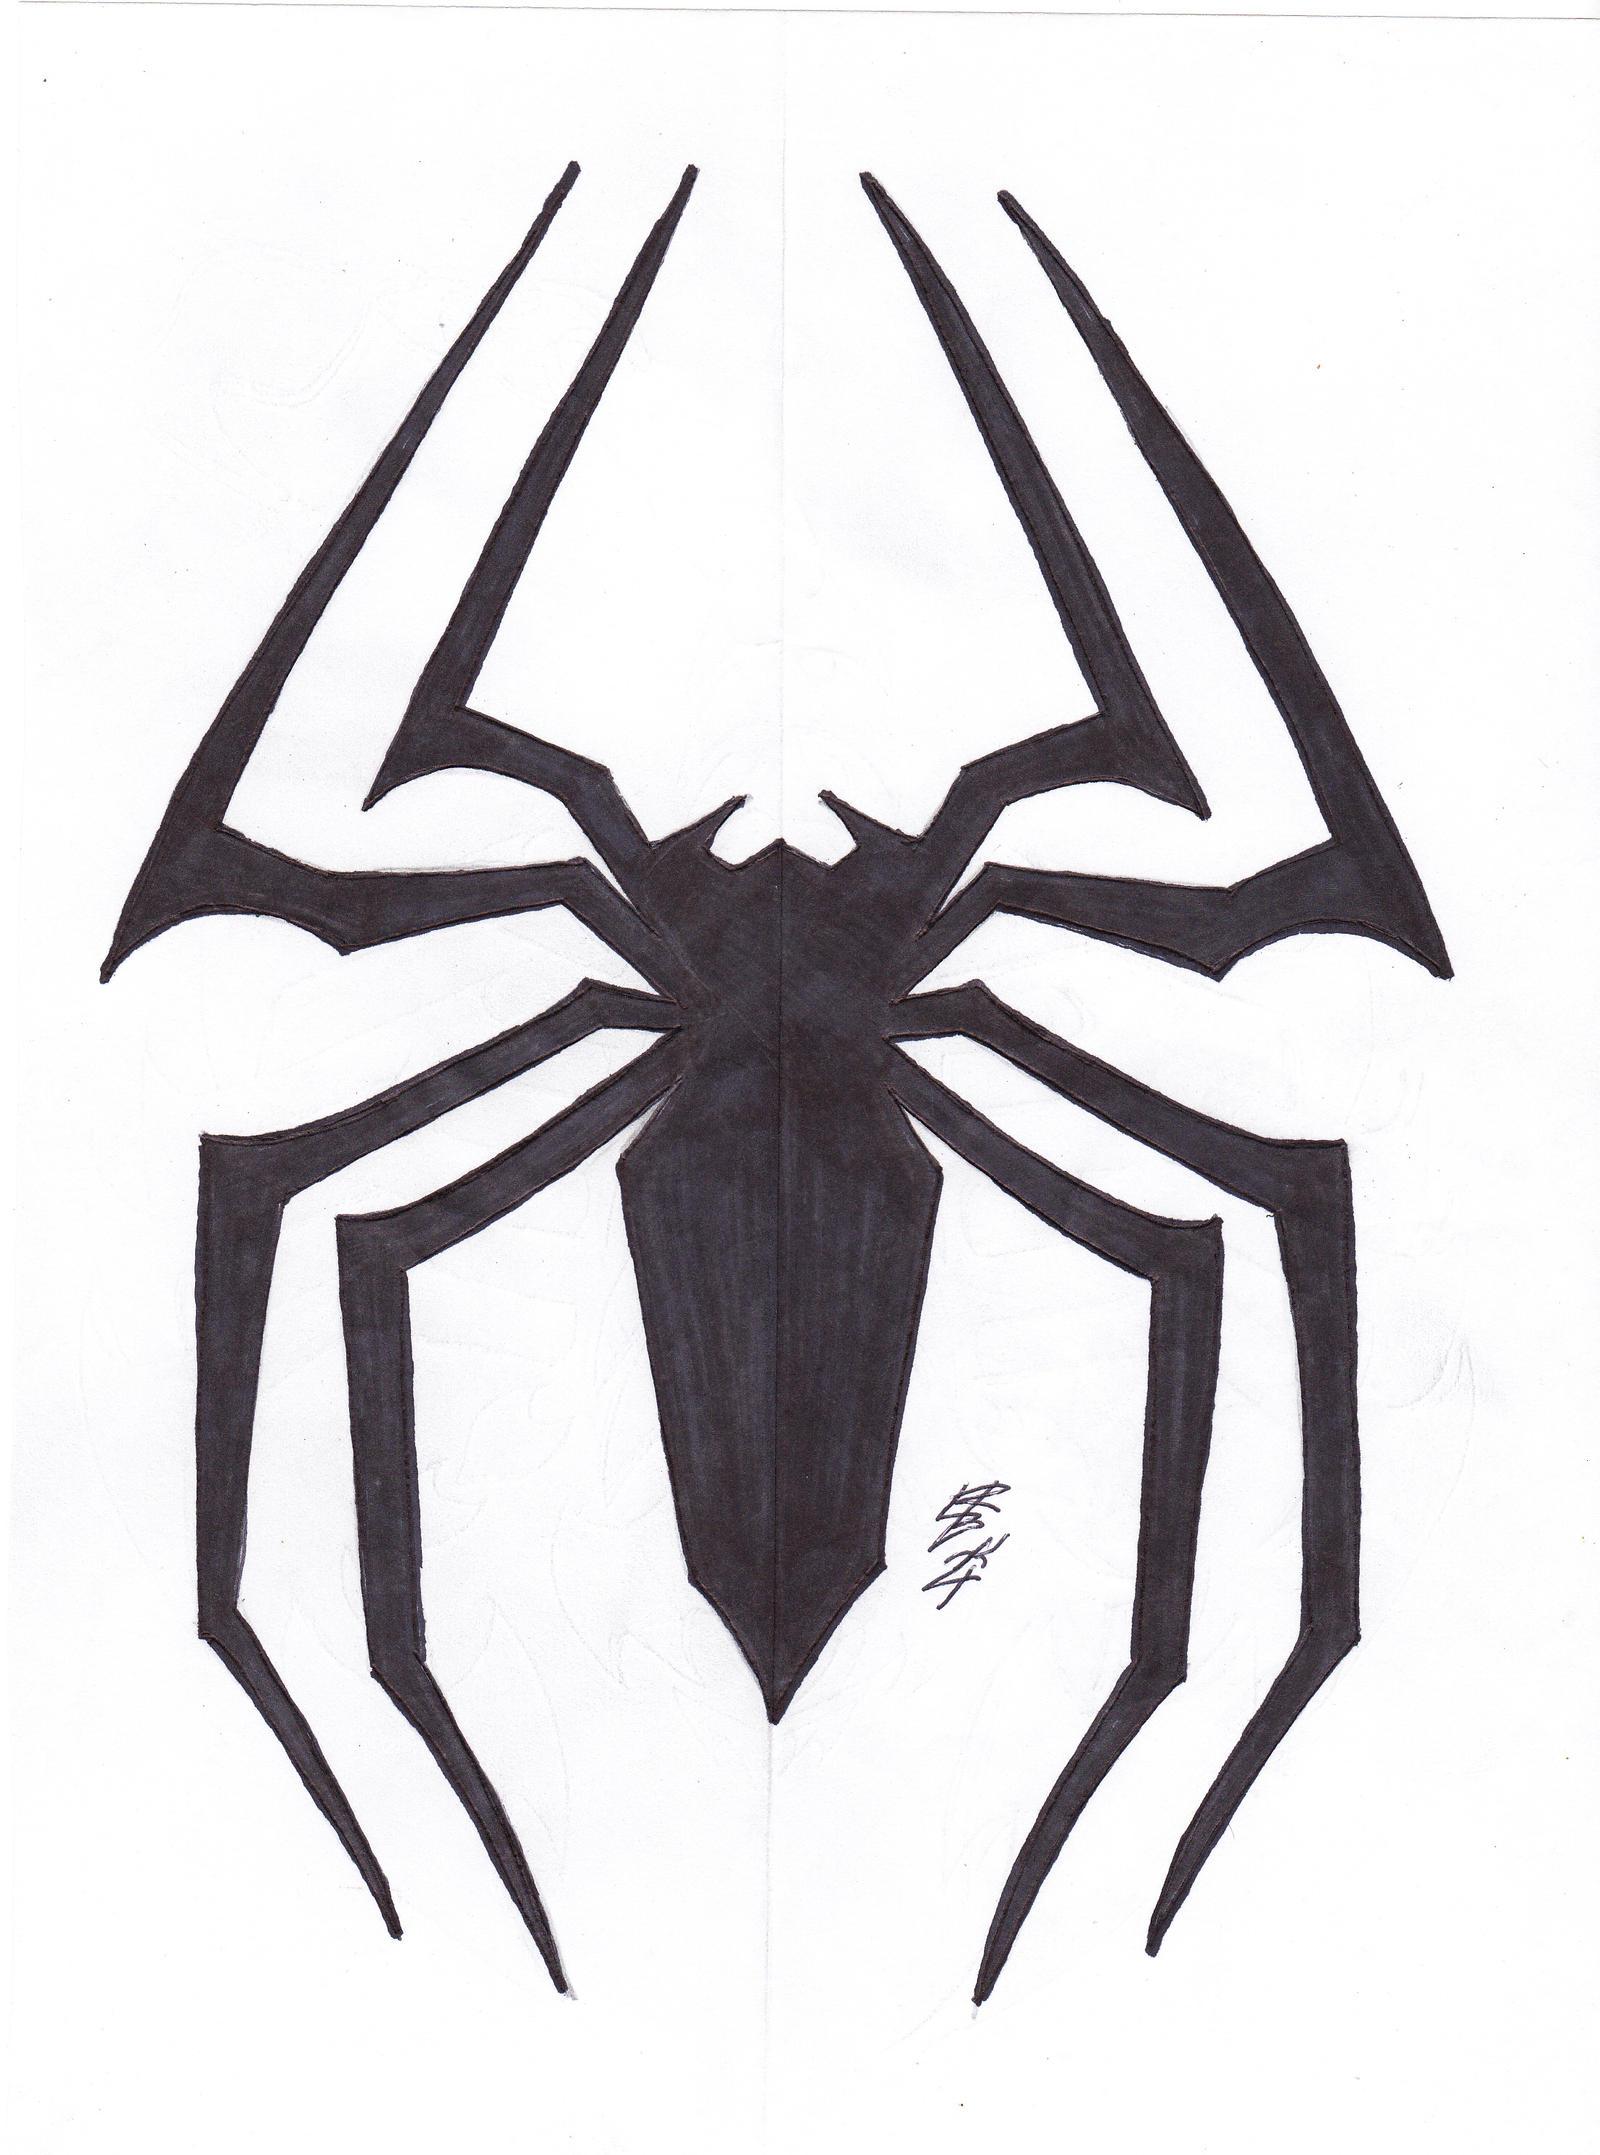 Venom spiderman symbol drawing - photo#13